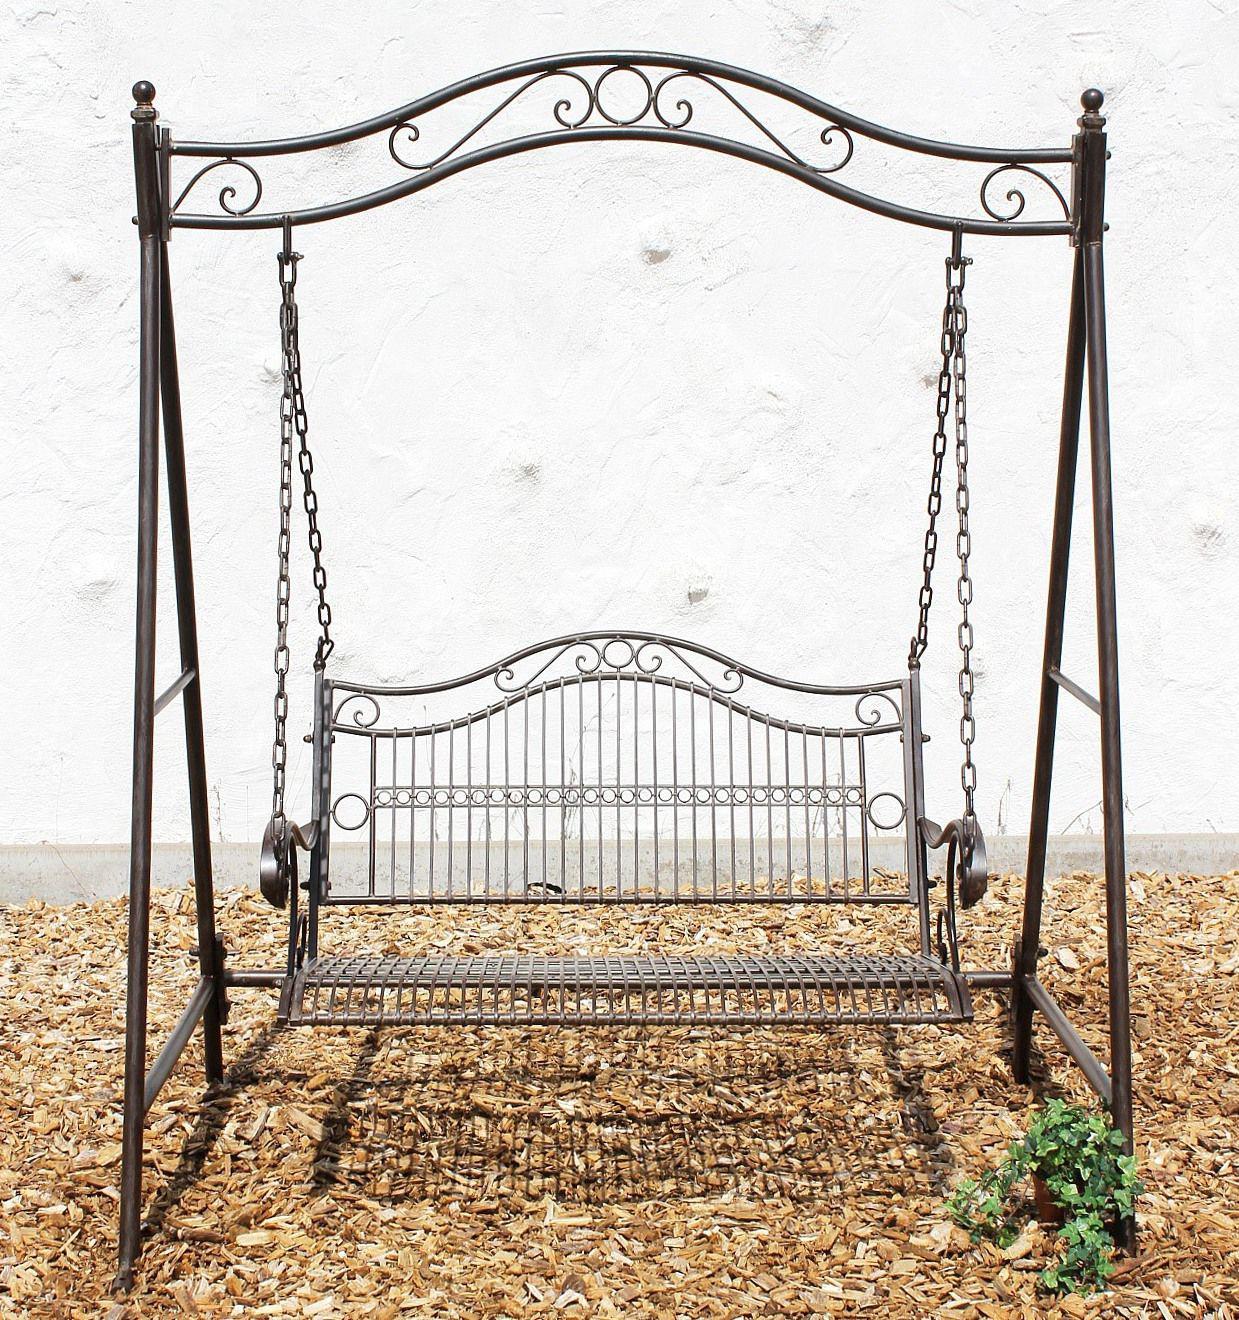 schaukel 082505 hollywoodschaukel antik metall schmiedeeisen gartenschaukel ebay. Black Bedroom Furniture Sets. Home Design Ideas